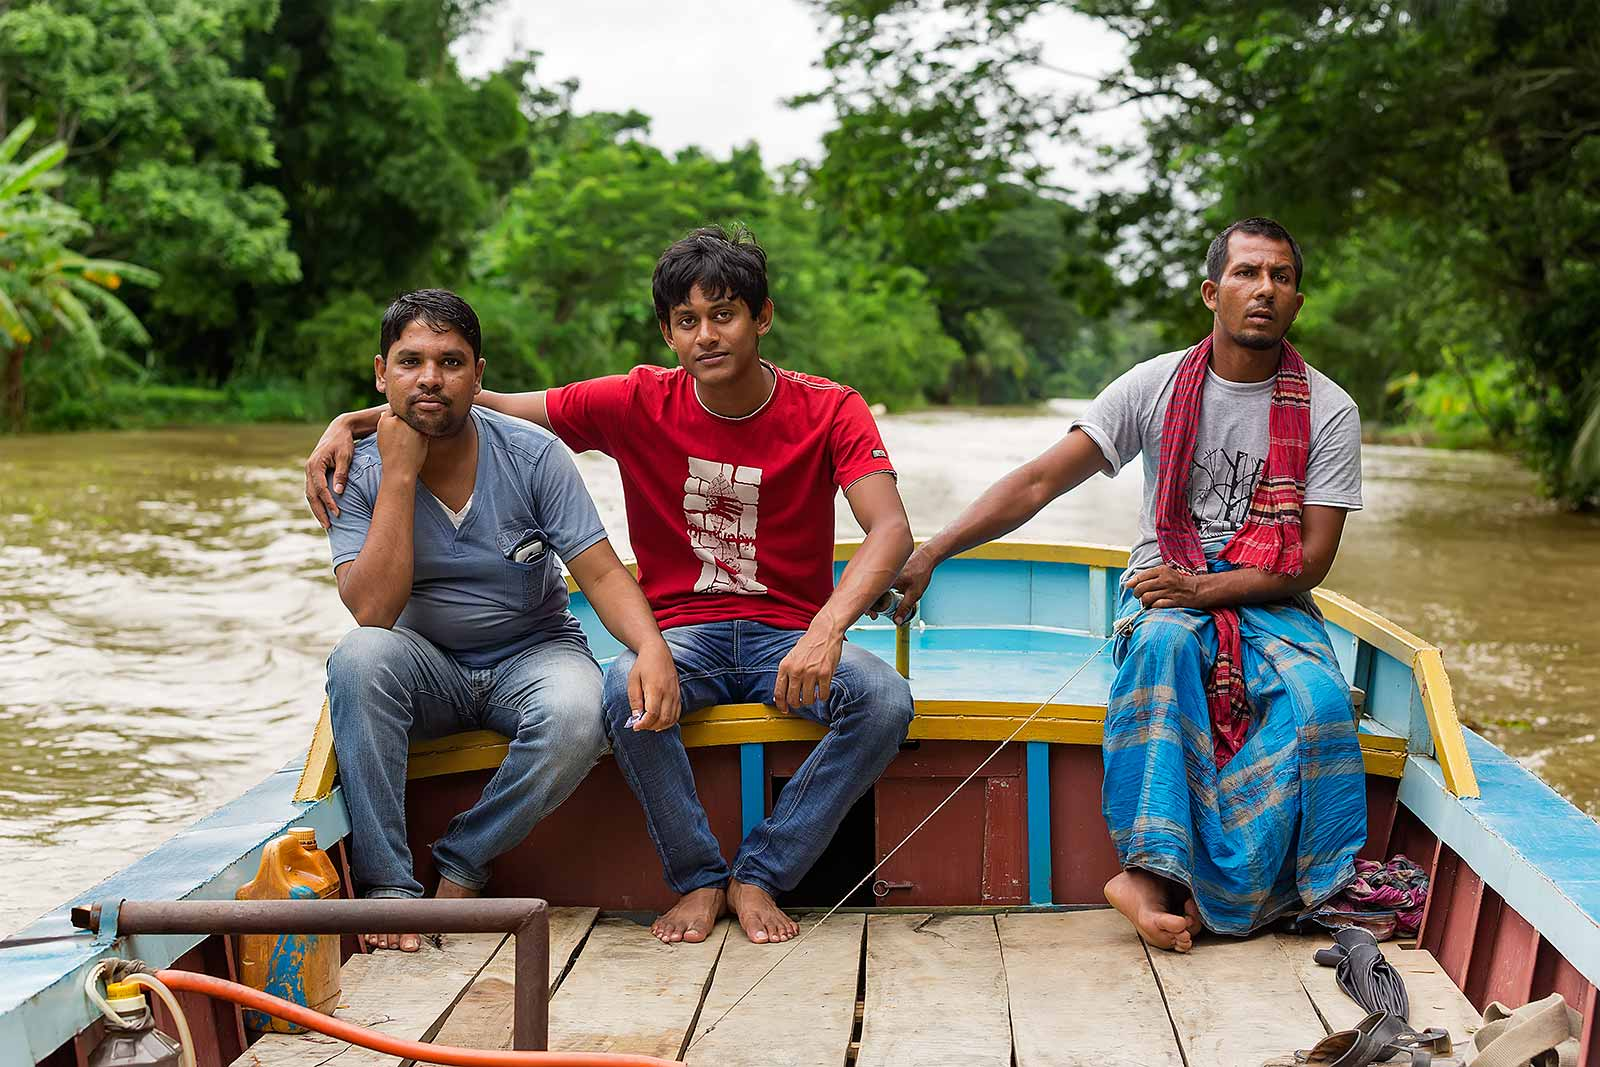 guava-plantations-boat-canal-swarupkathi-bangladesh-4